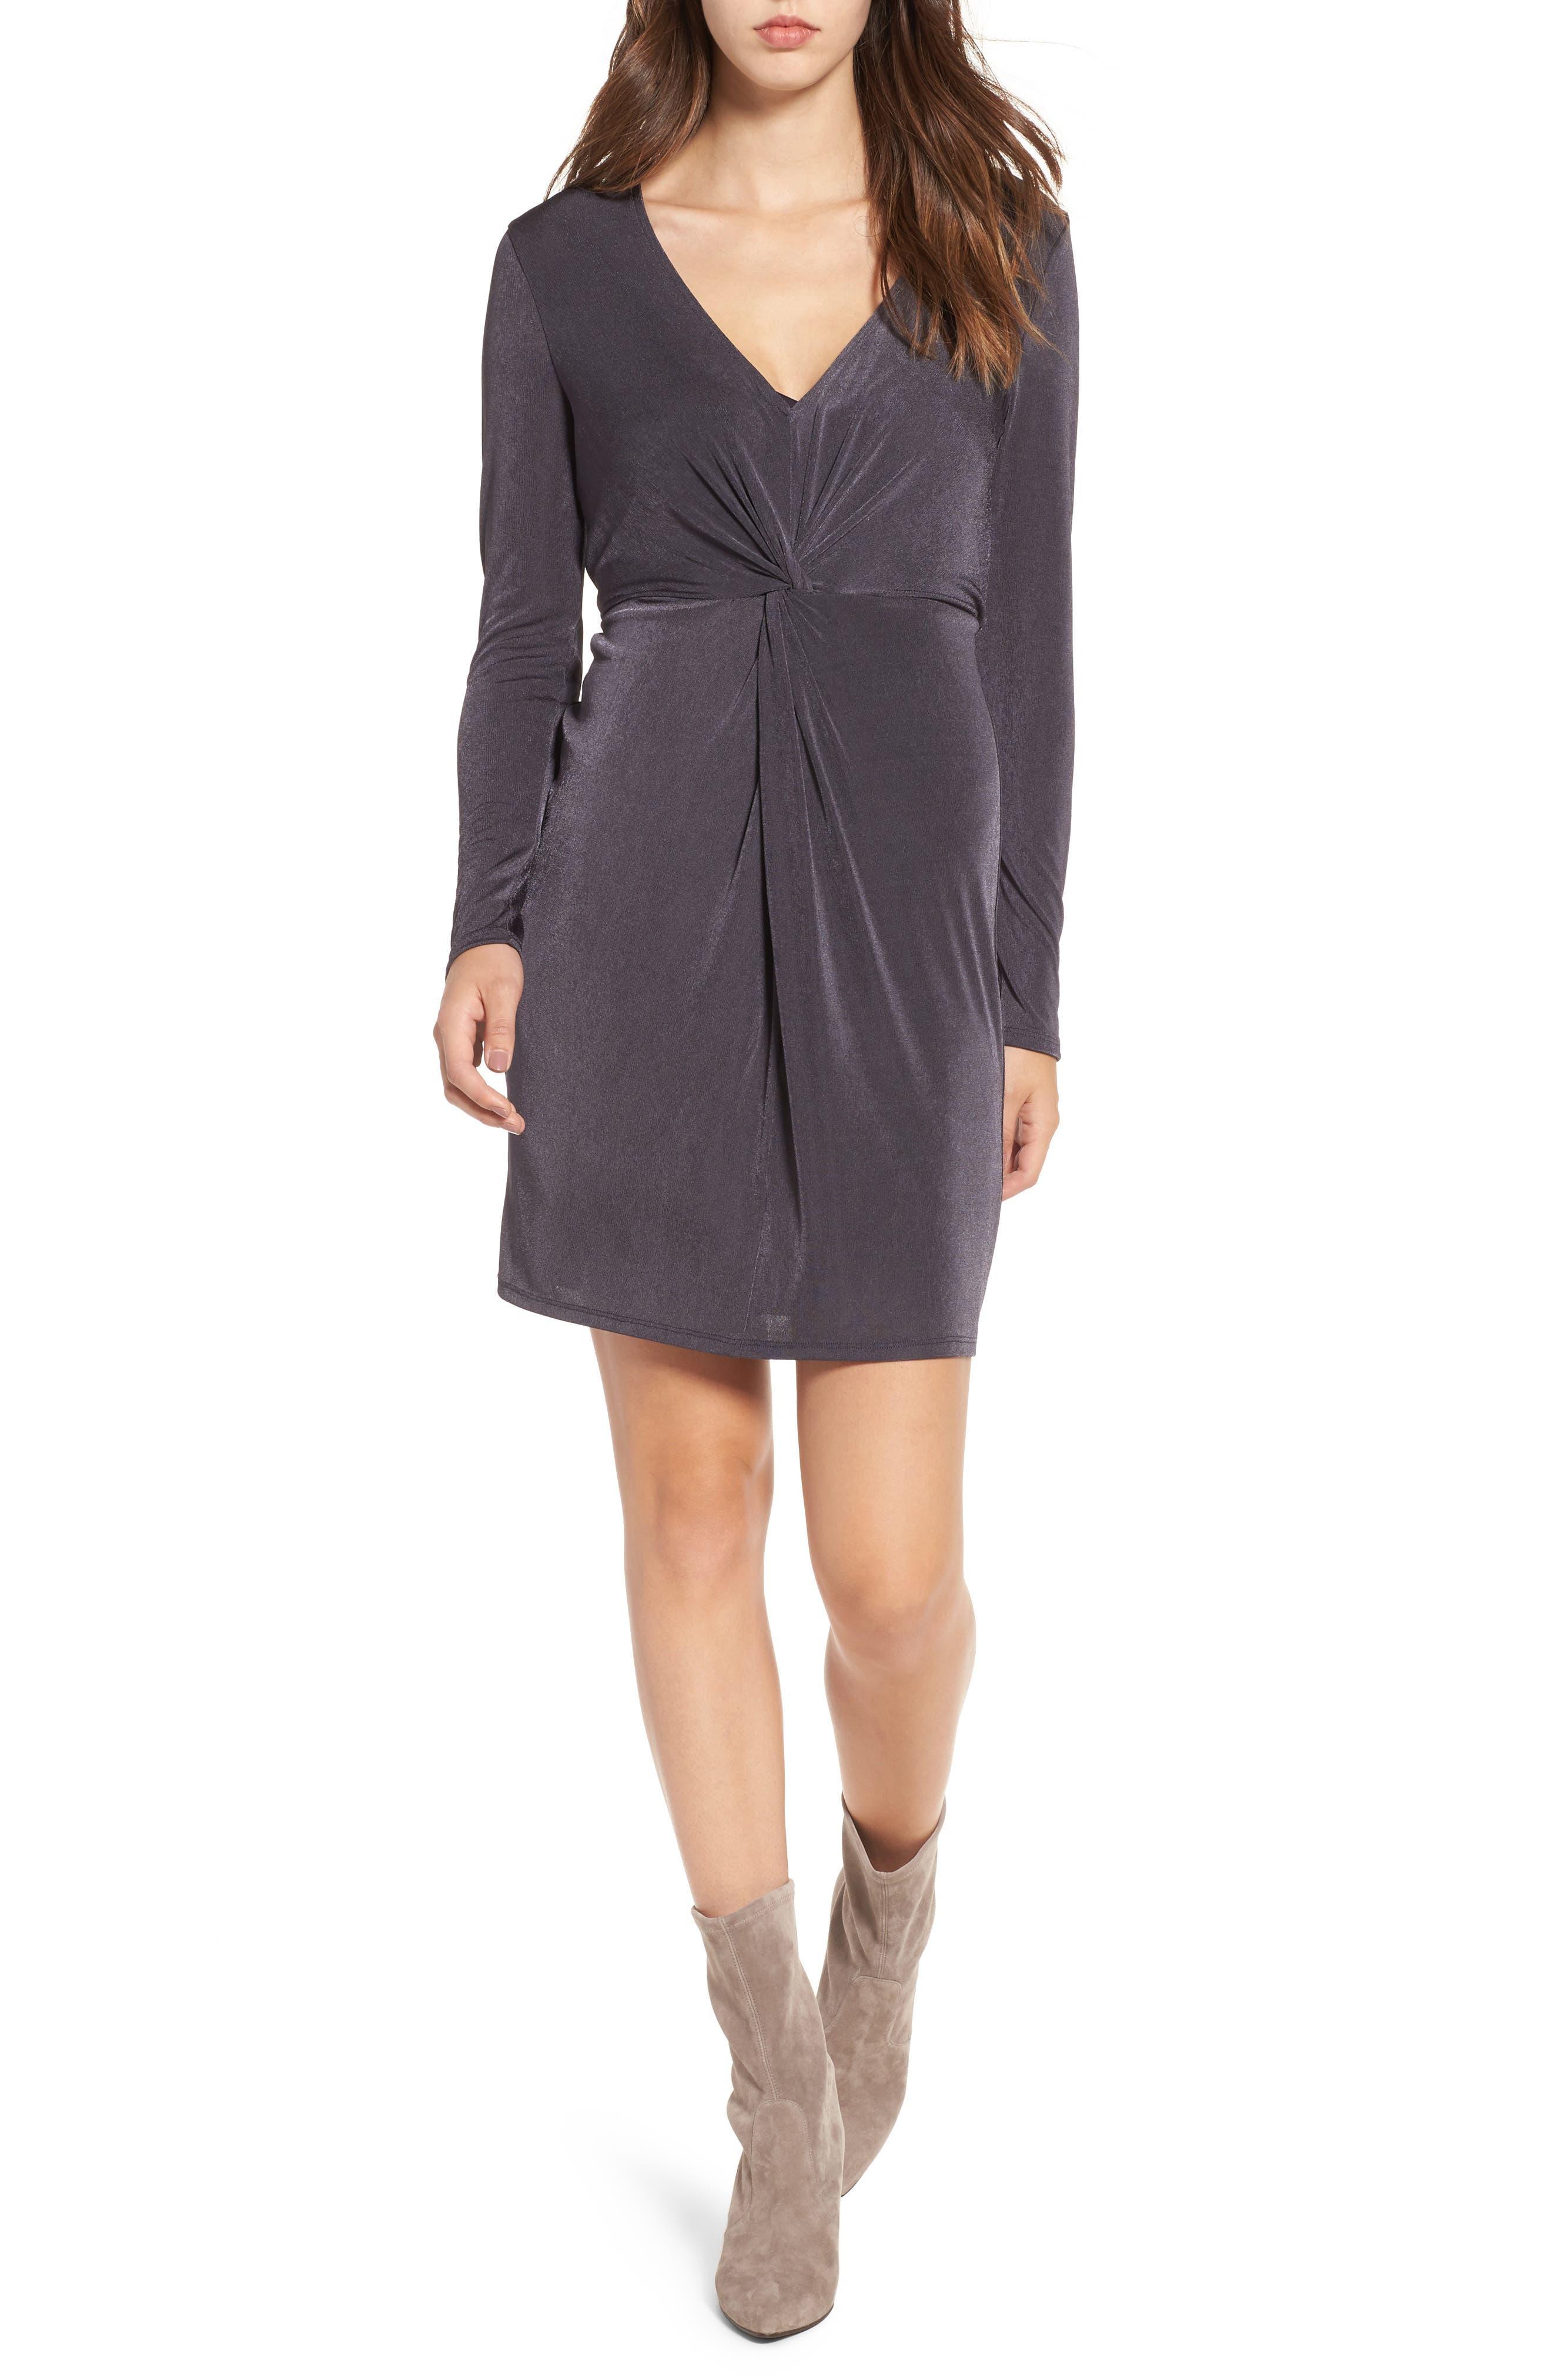 Main Image - STOREE Twist Front Knit Dress